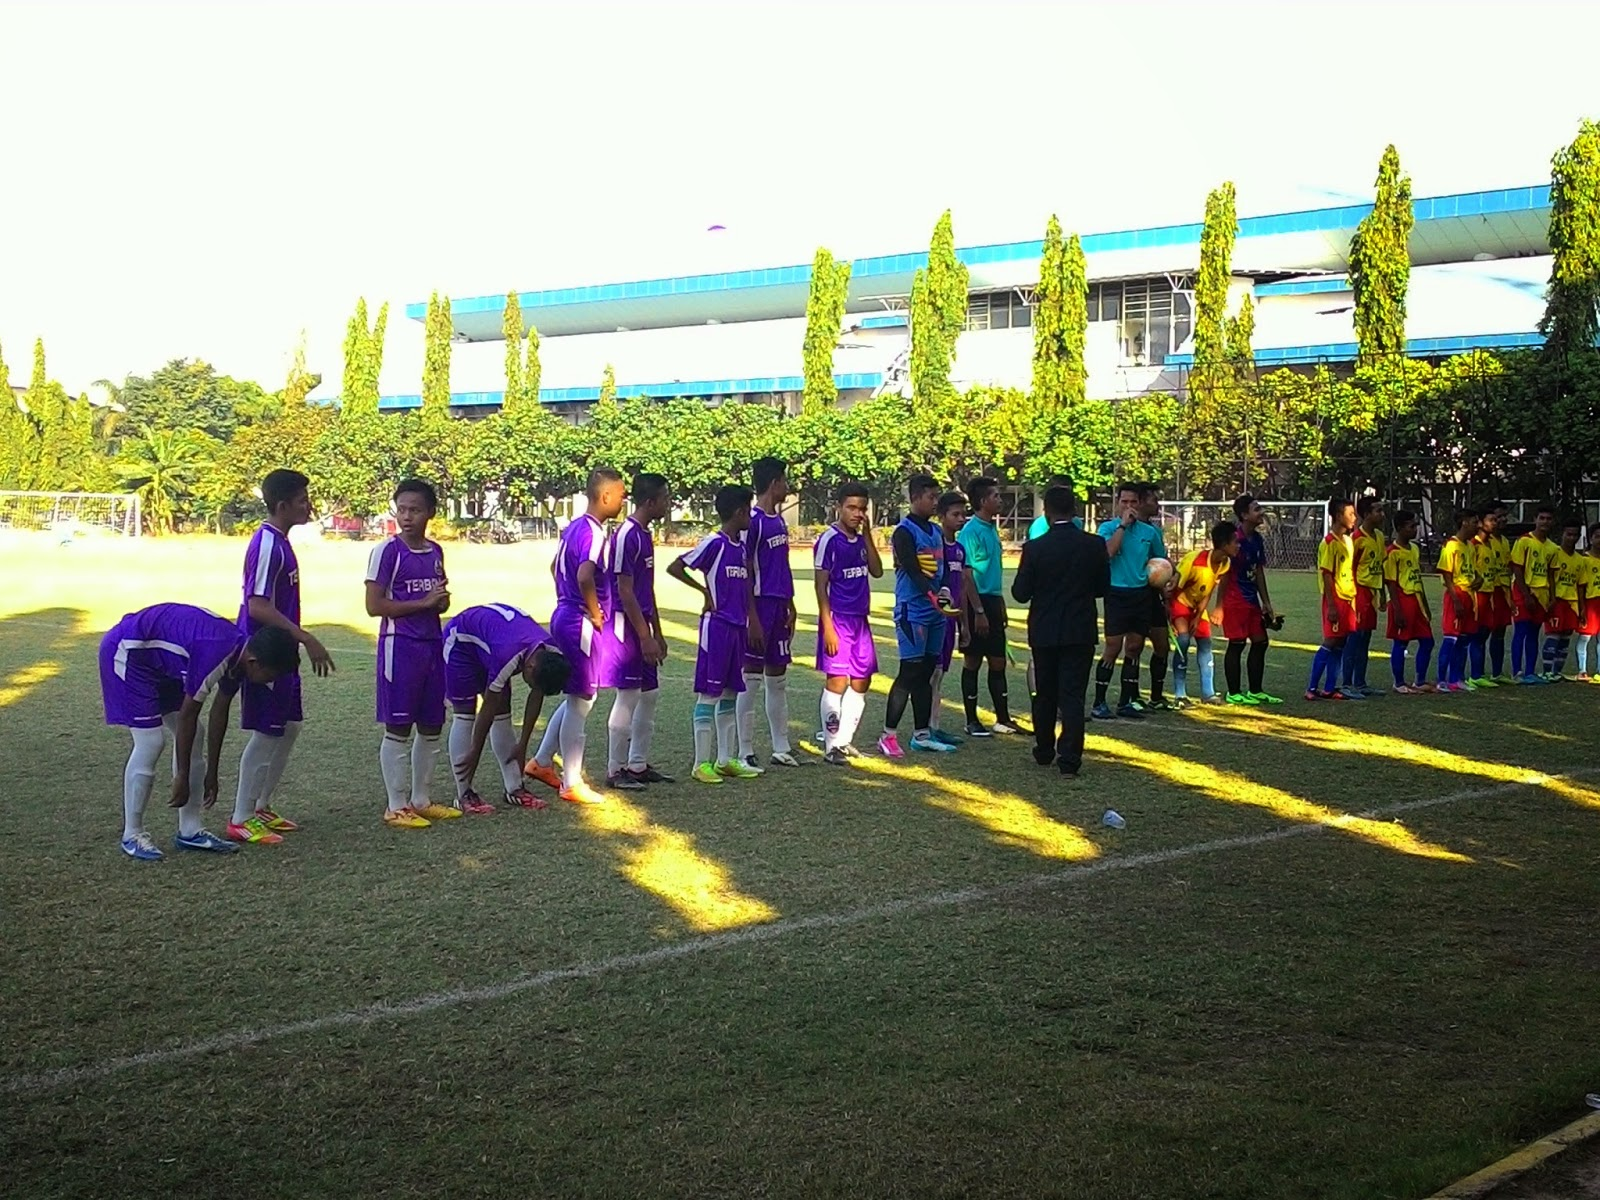 sekolah sepak bola terang bangsa terang bangsa juara liga